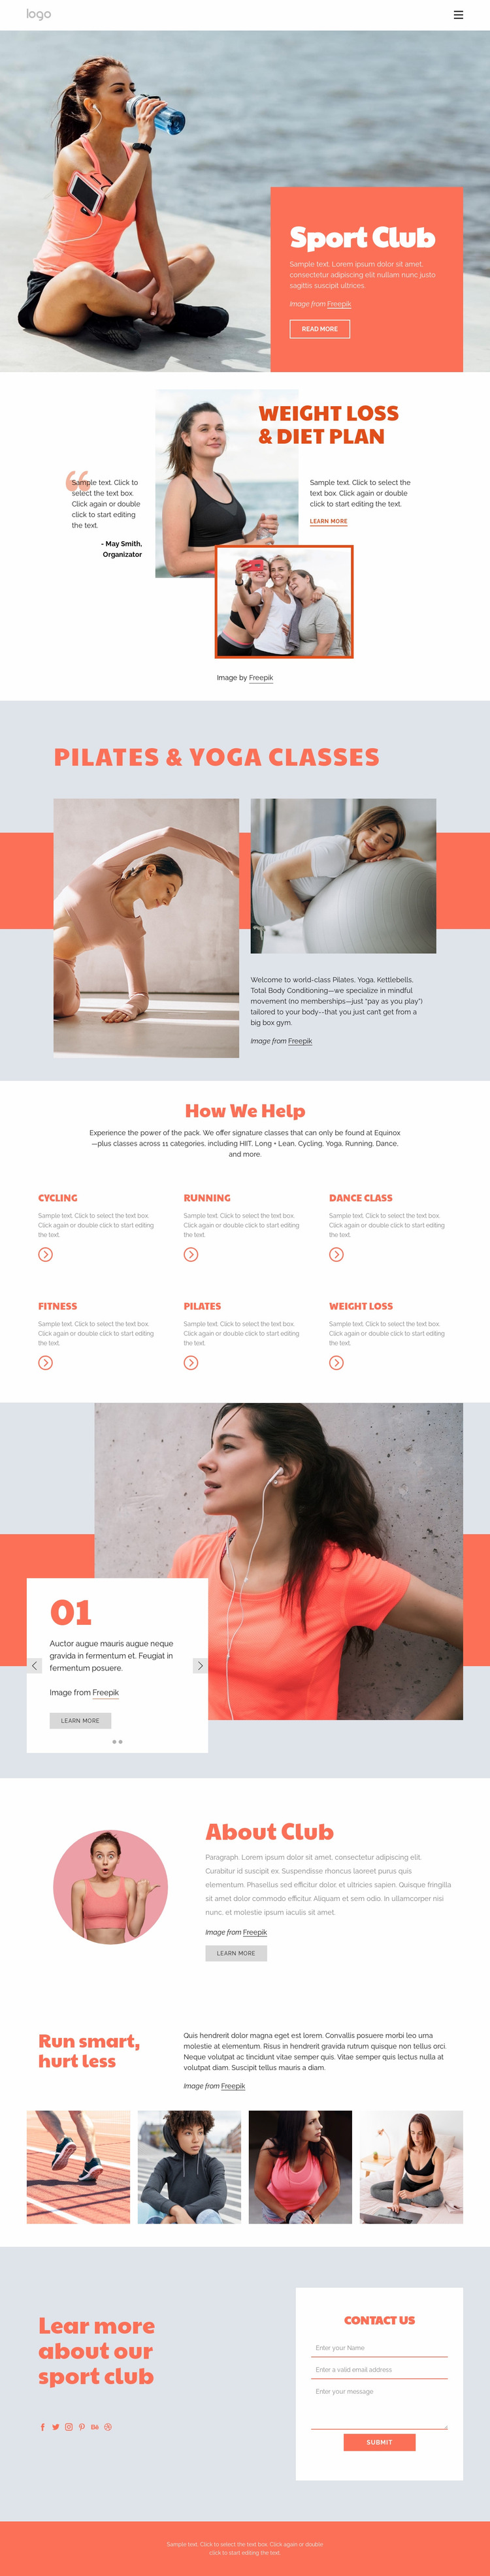 Pilates vs yoga Website Mockup